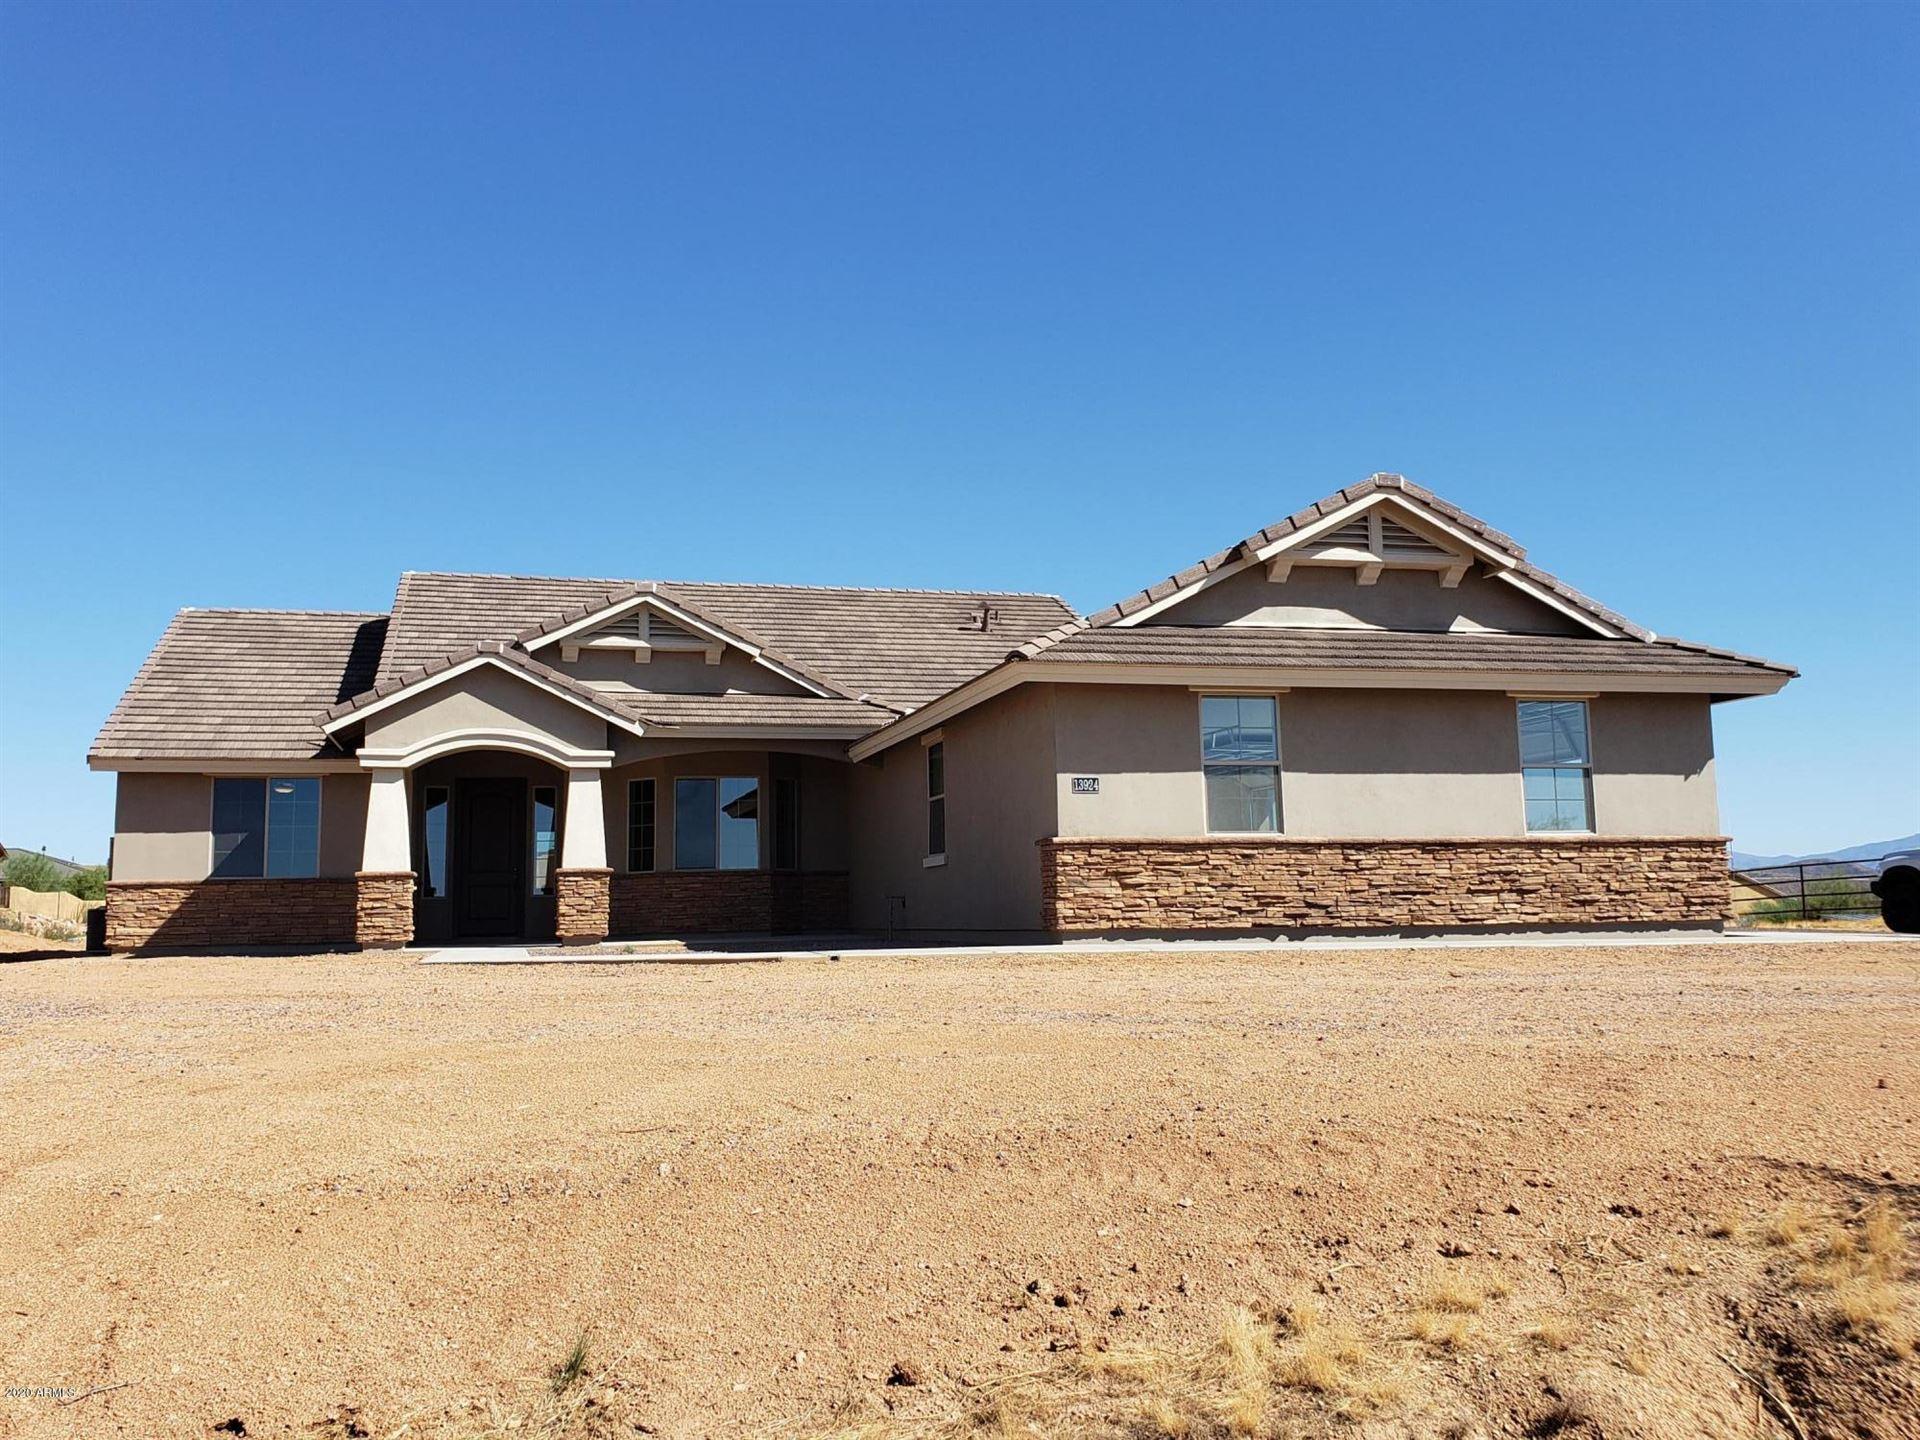 2053 W JOSIAH Trail, Queen Creek, AZ 85142 - #: 6096445